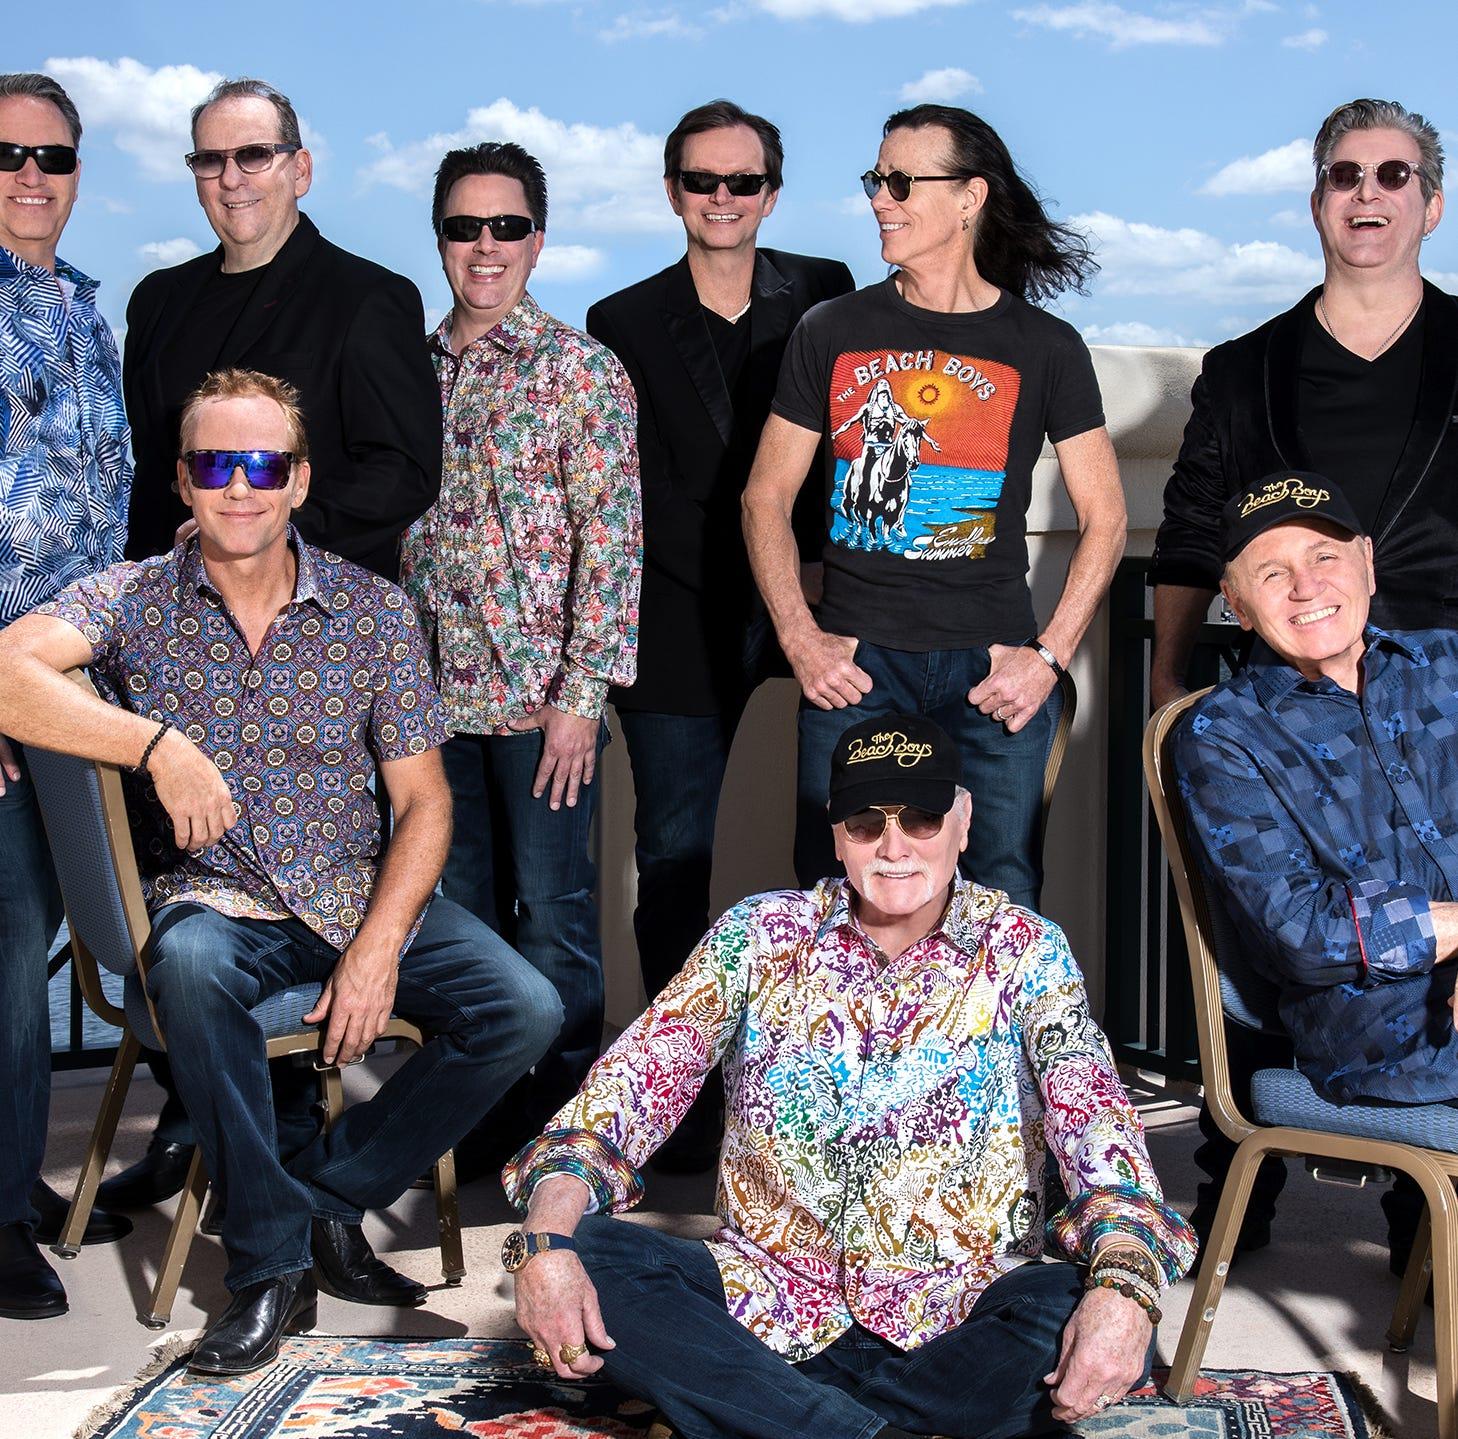 The Beach Boys to headline NJ Festival of Ballooning